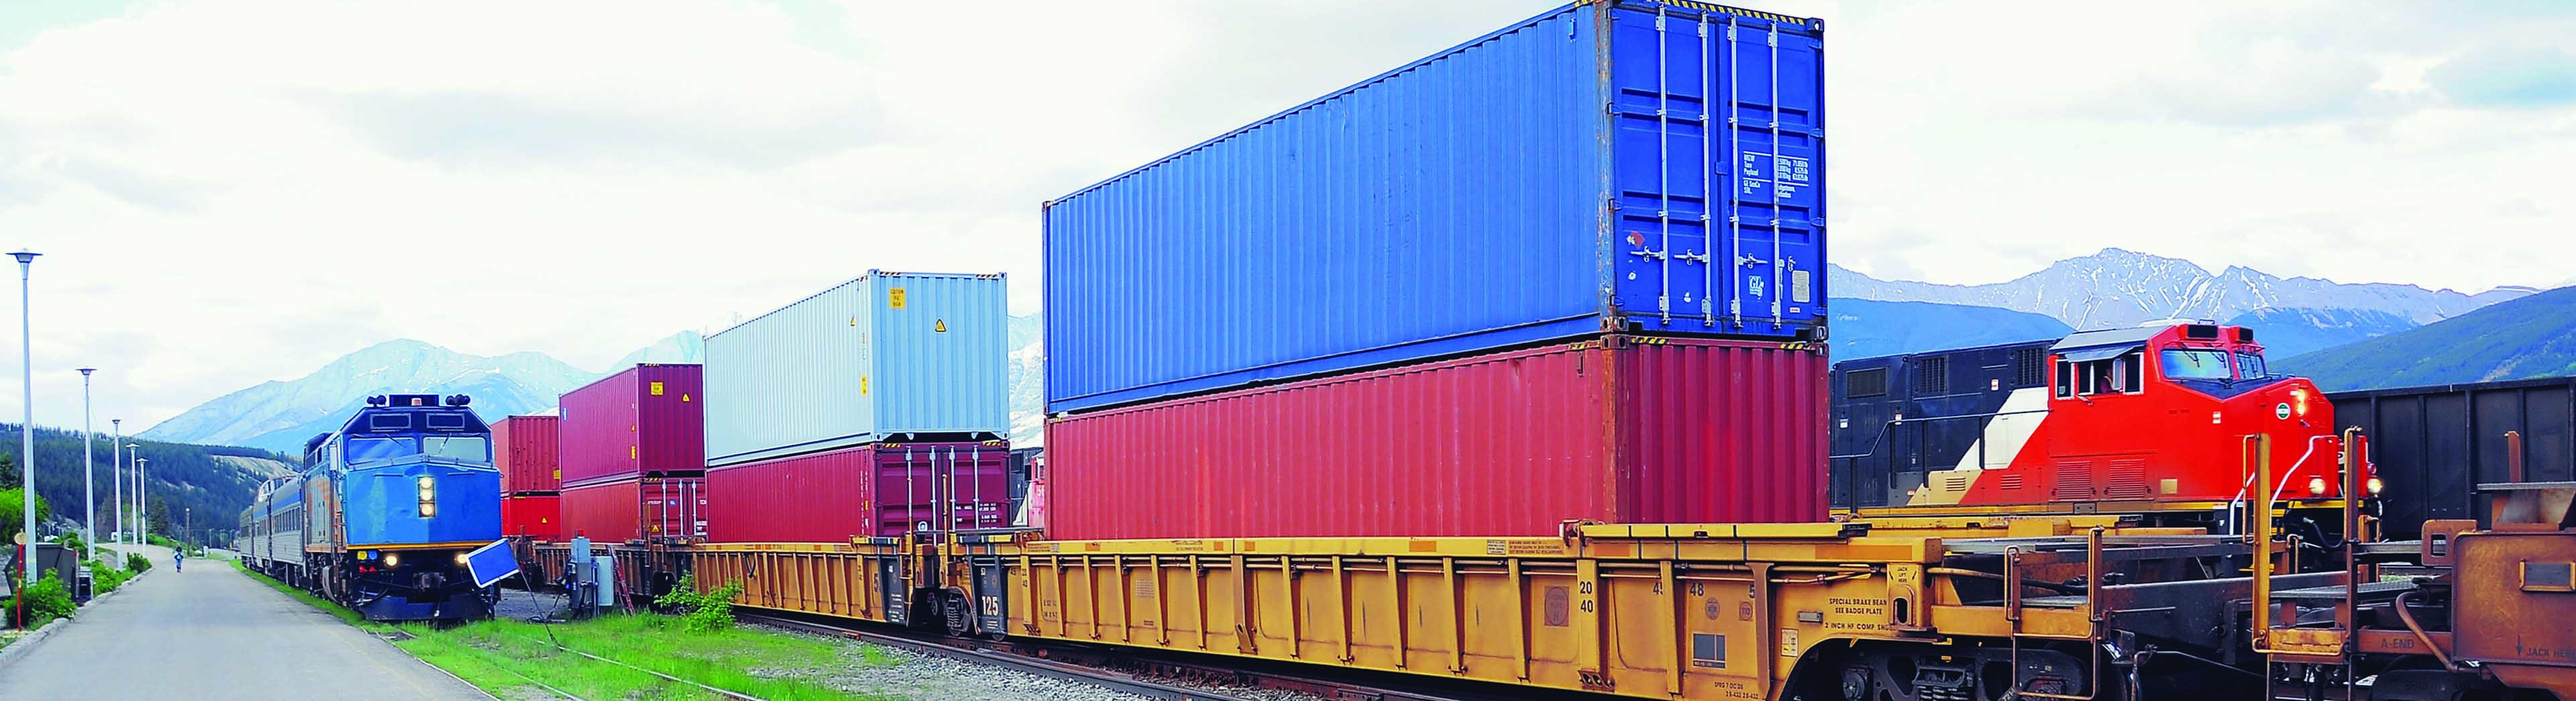 union pacific rail